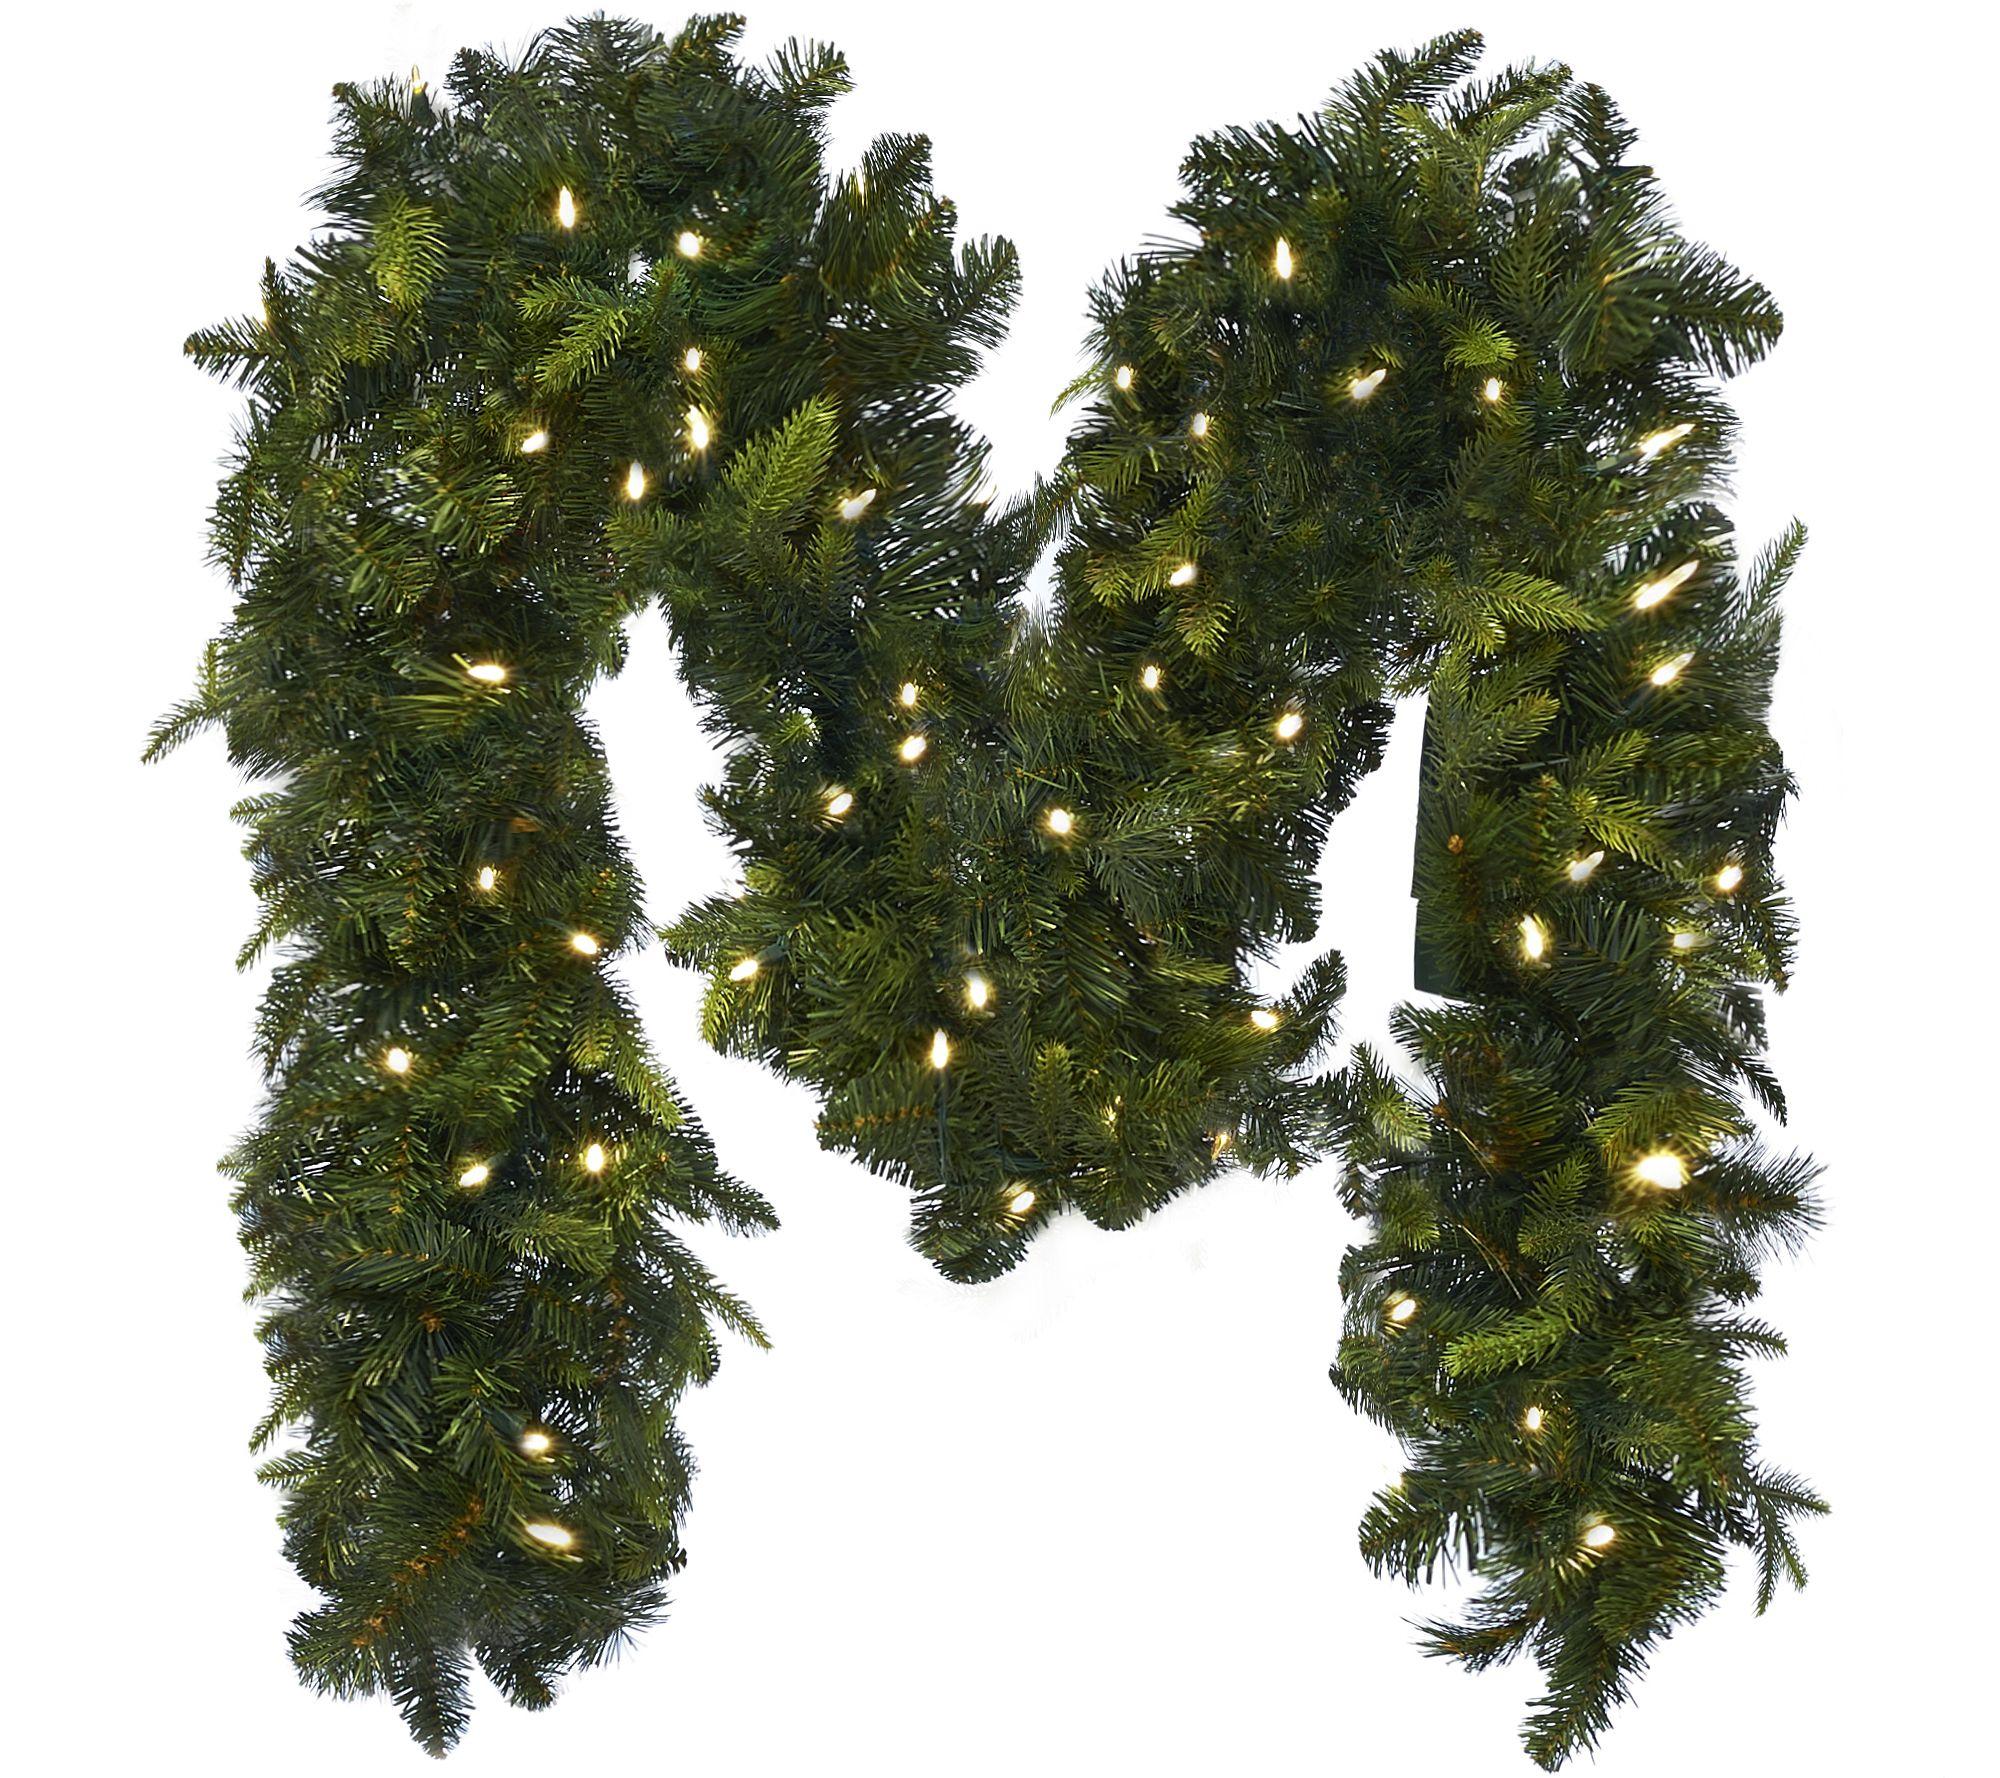 Prelit Christmas Trees On Sale